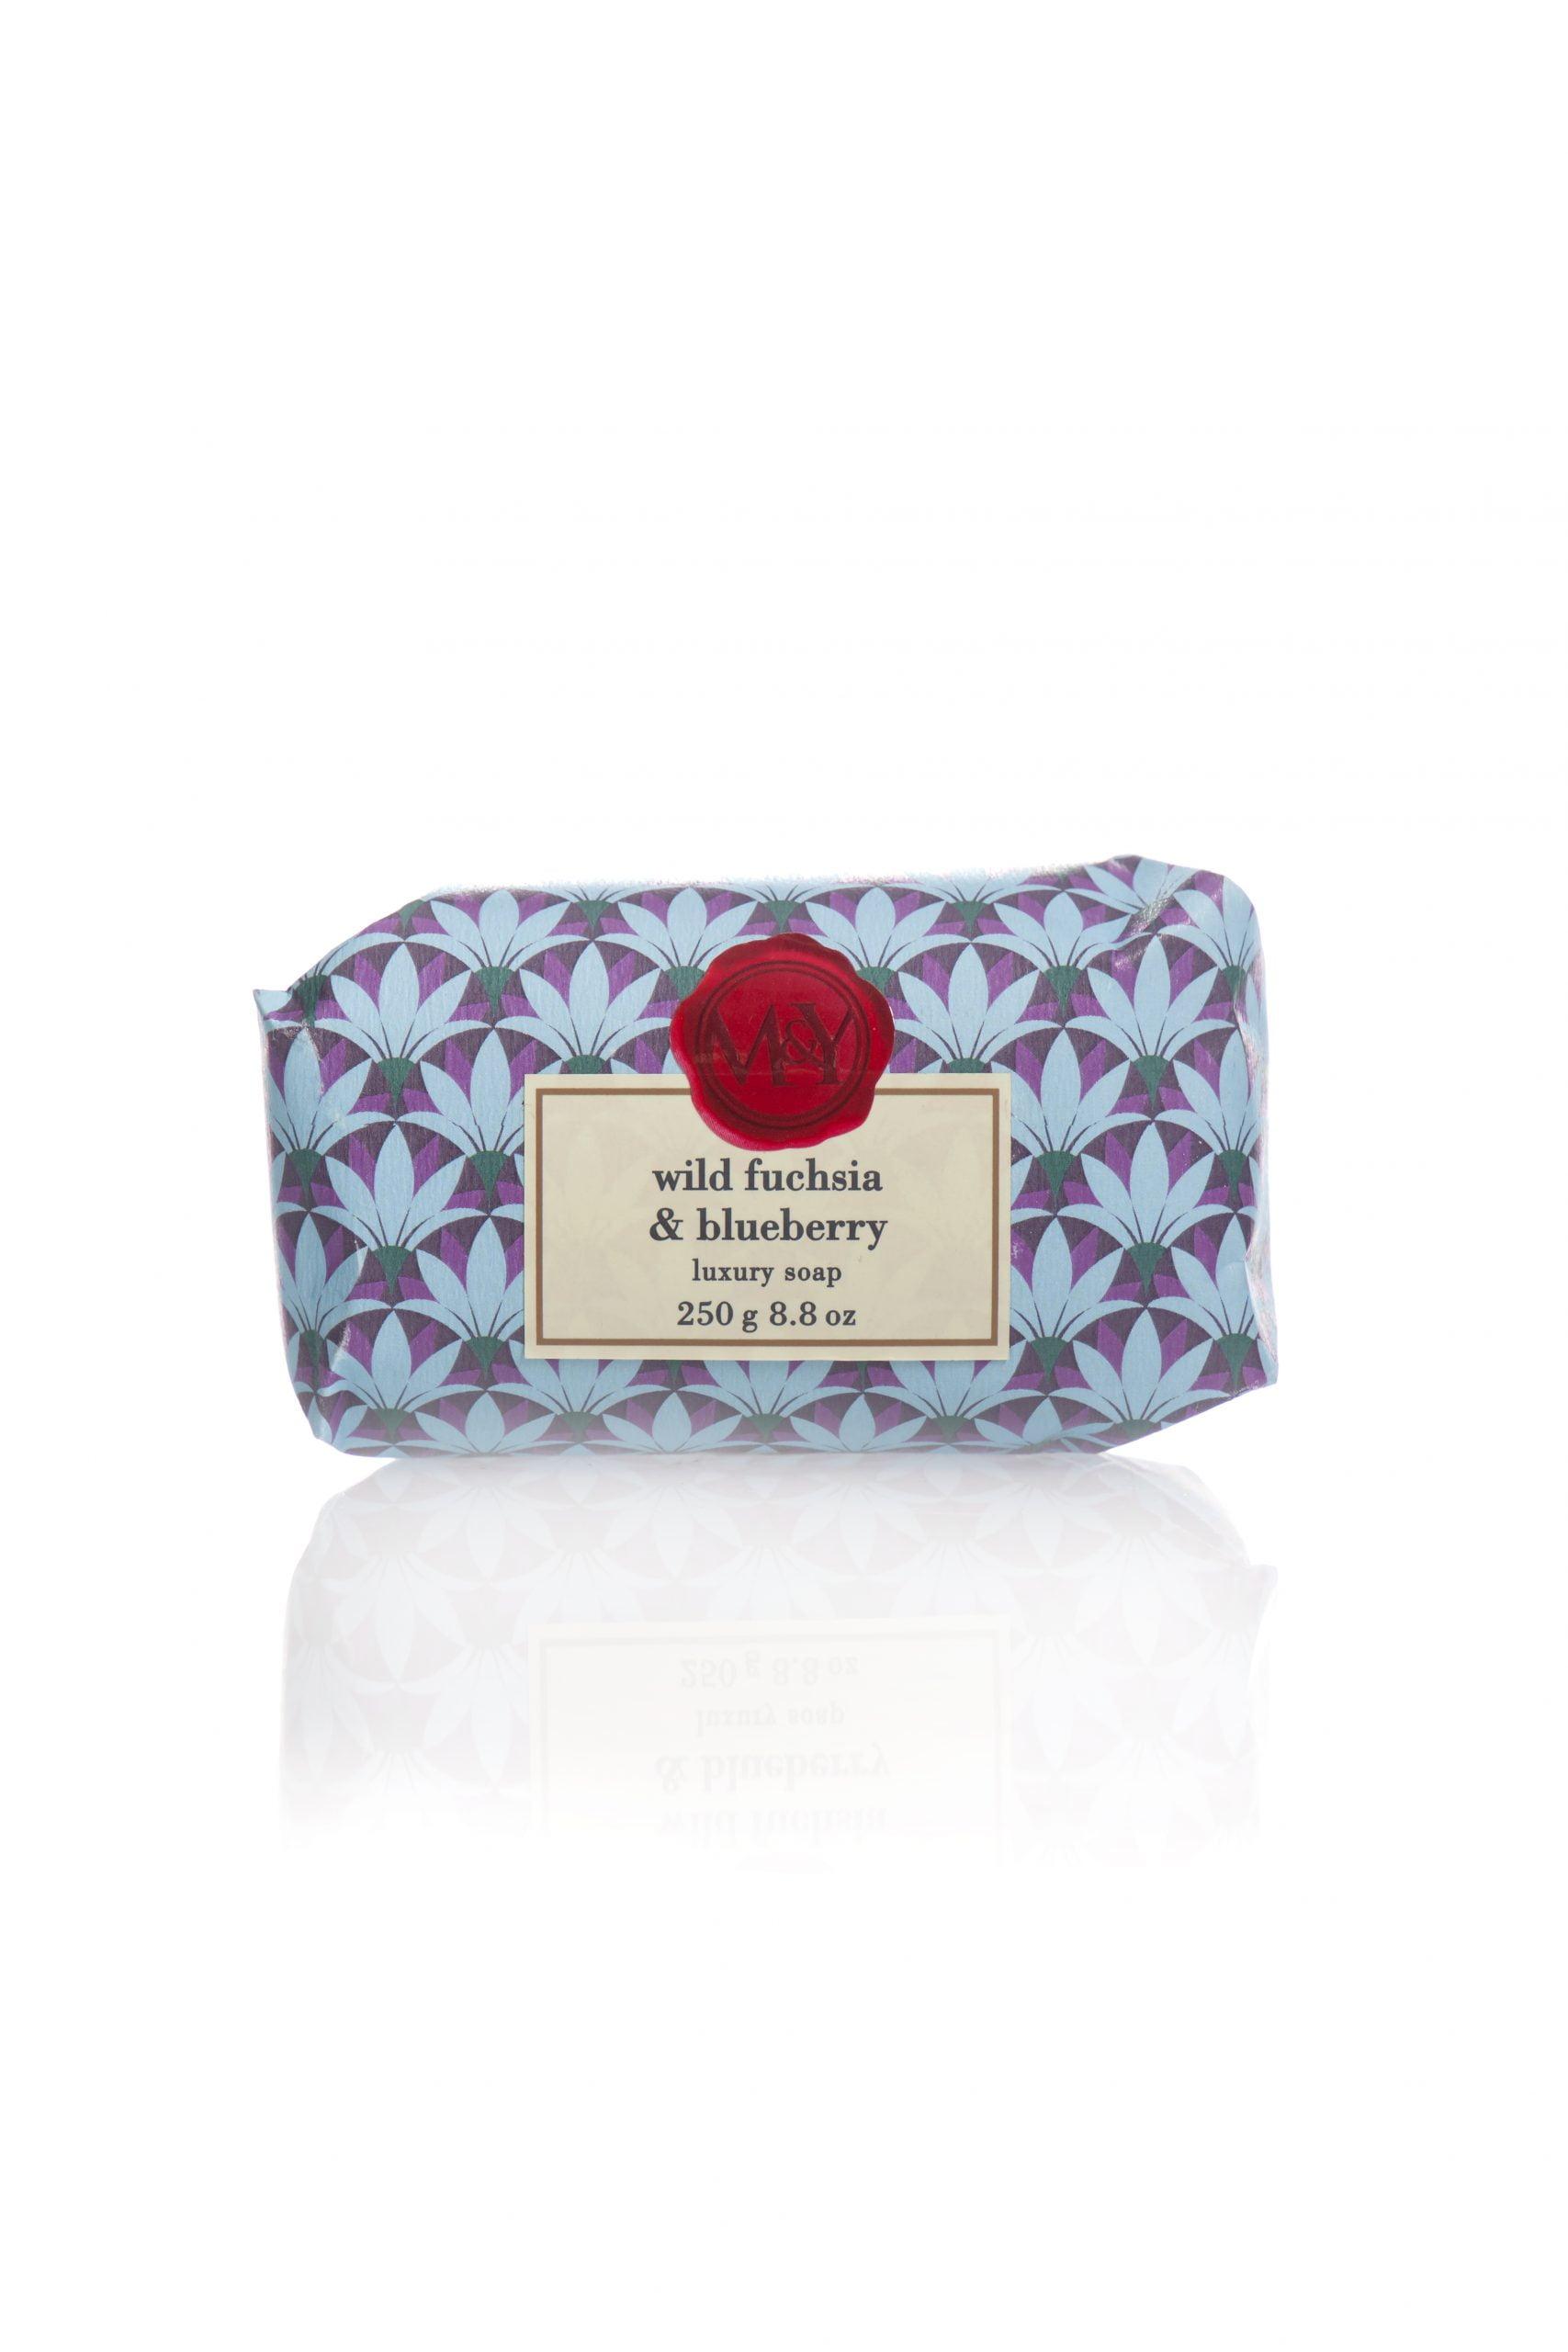 MY-Wild-Fuchsia-Blueberry-250g-Luxury-Soap-scaled-1.jpg